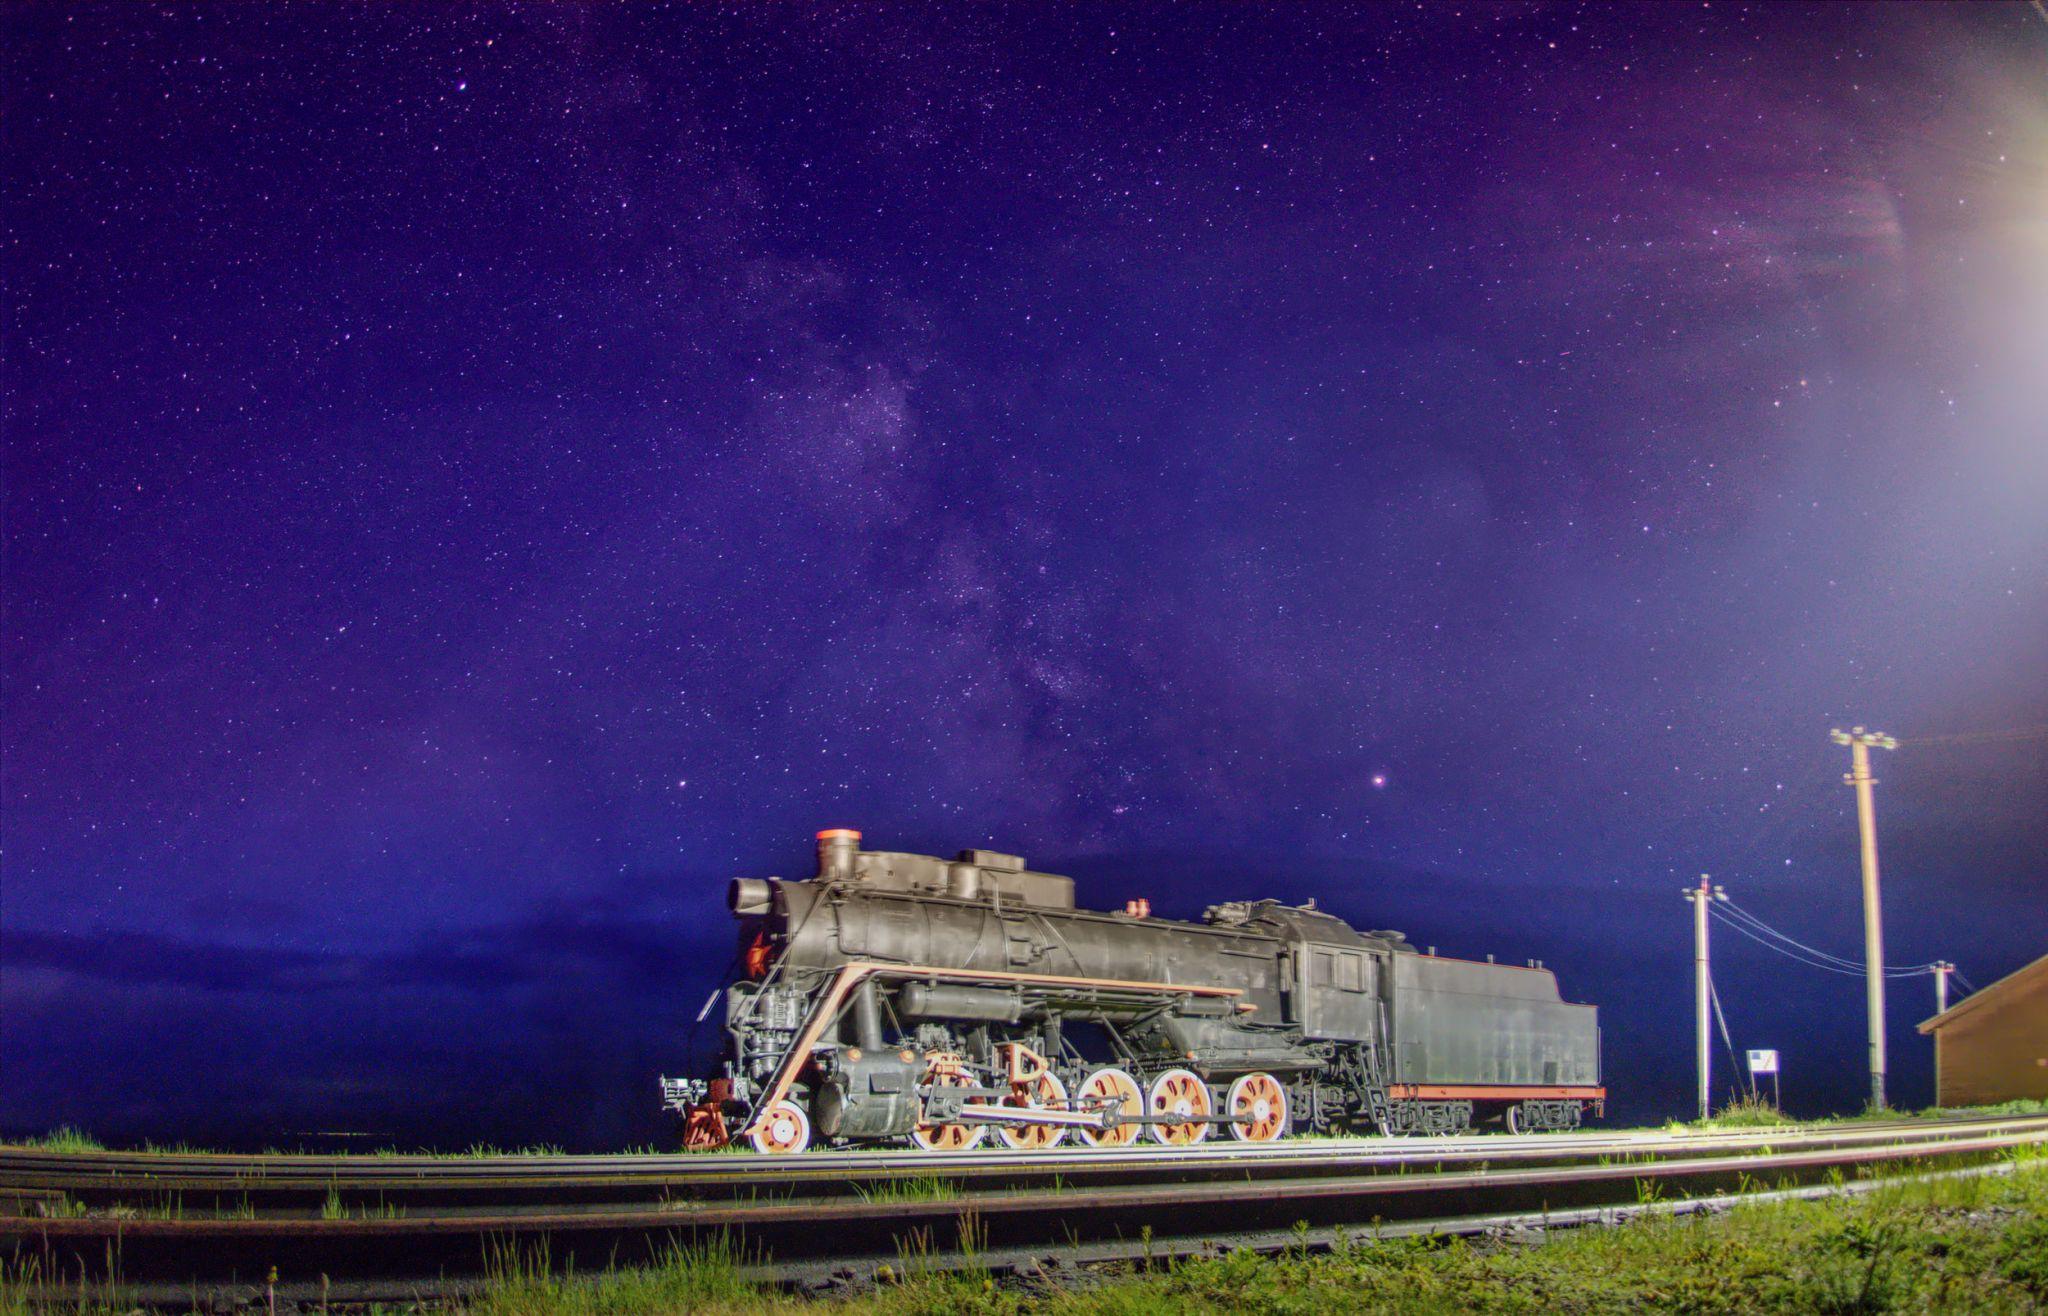 Port Baikal - Steam powered locomotive, Russian Federation